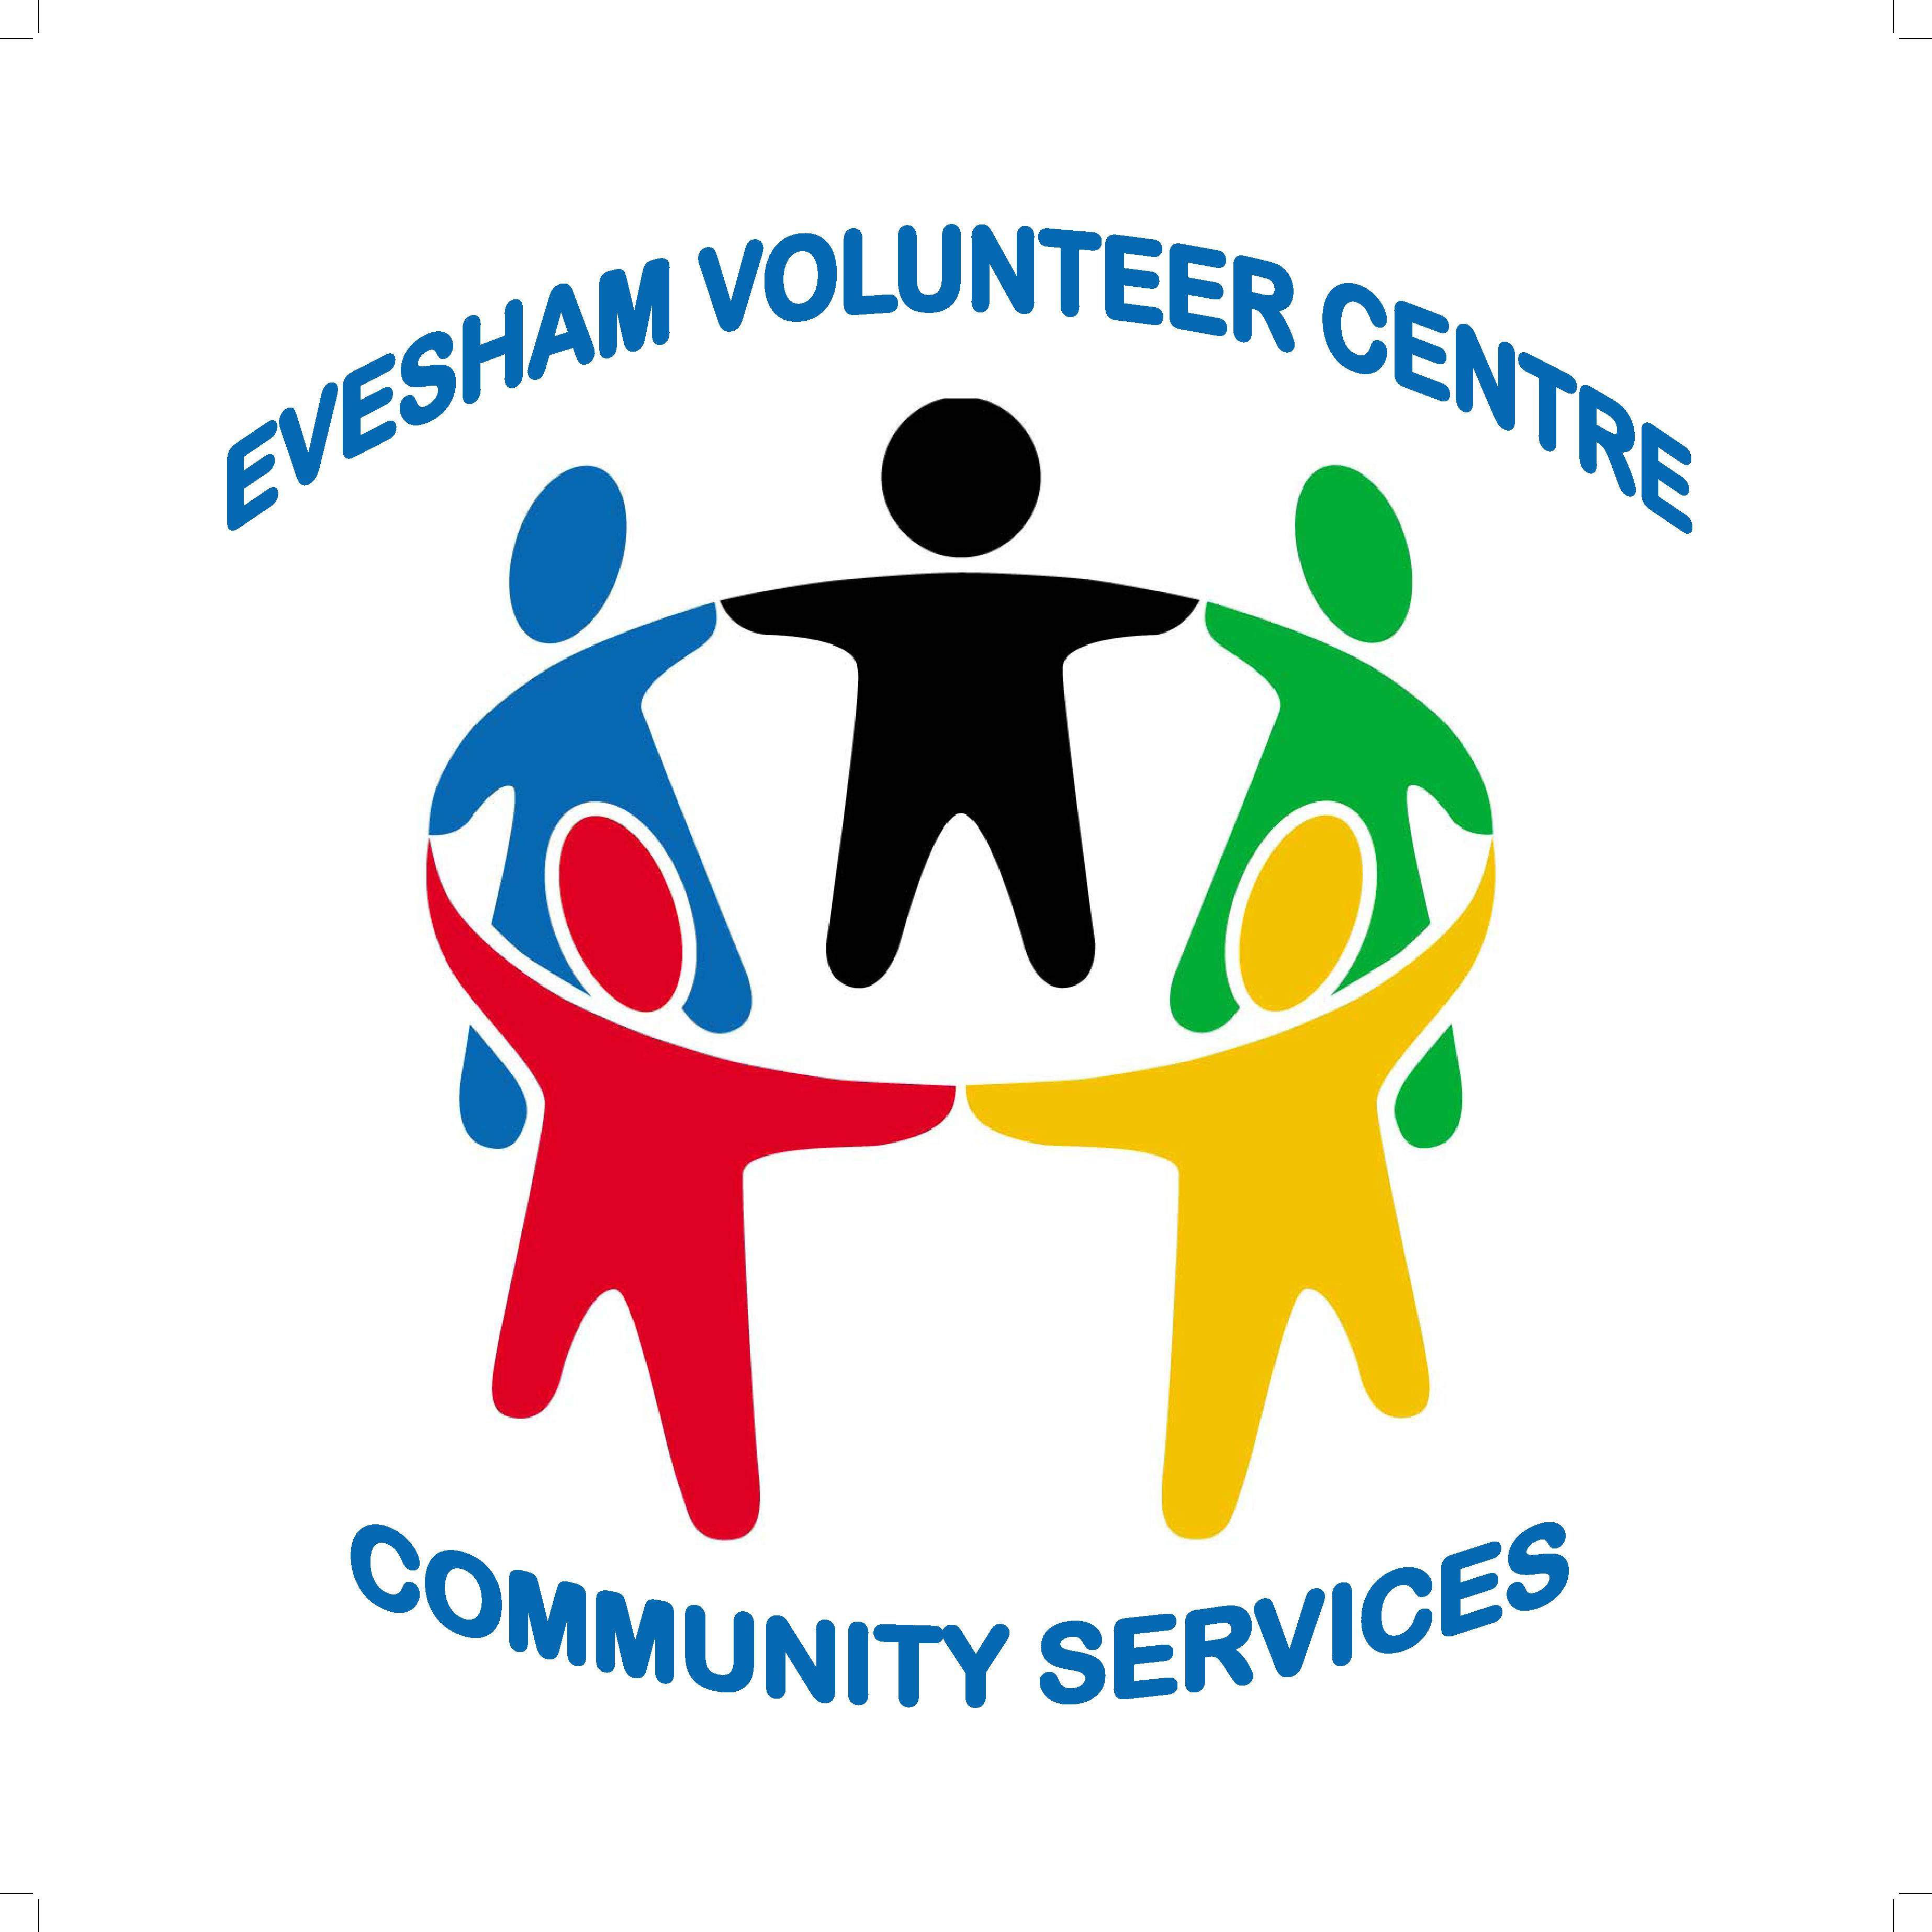 (c) Eveshamvolunteers.org.uk